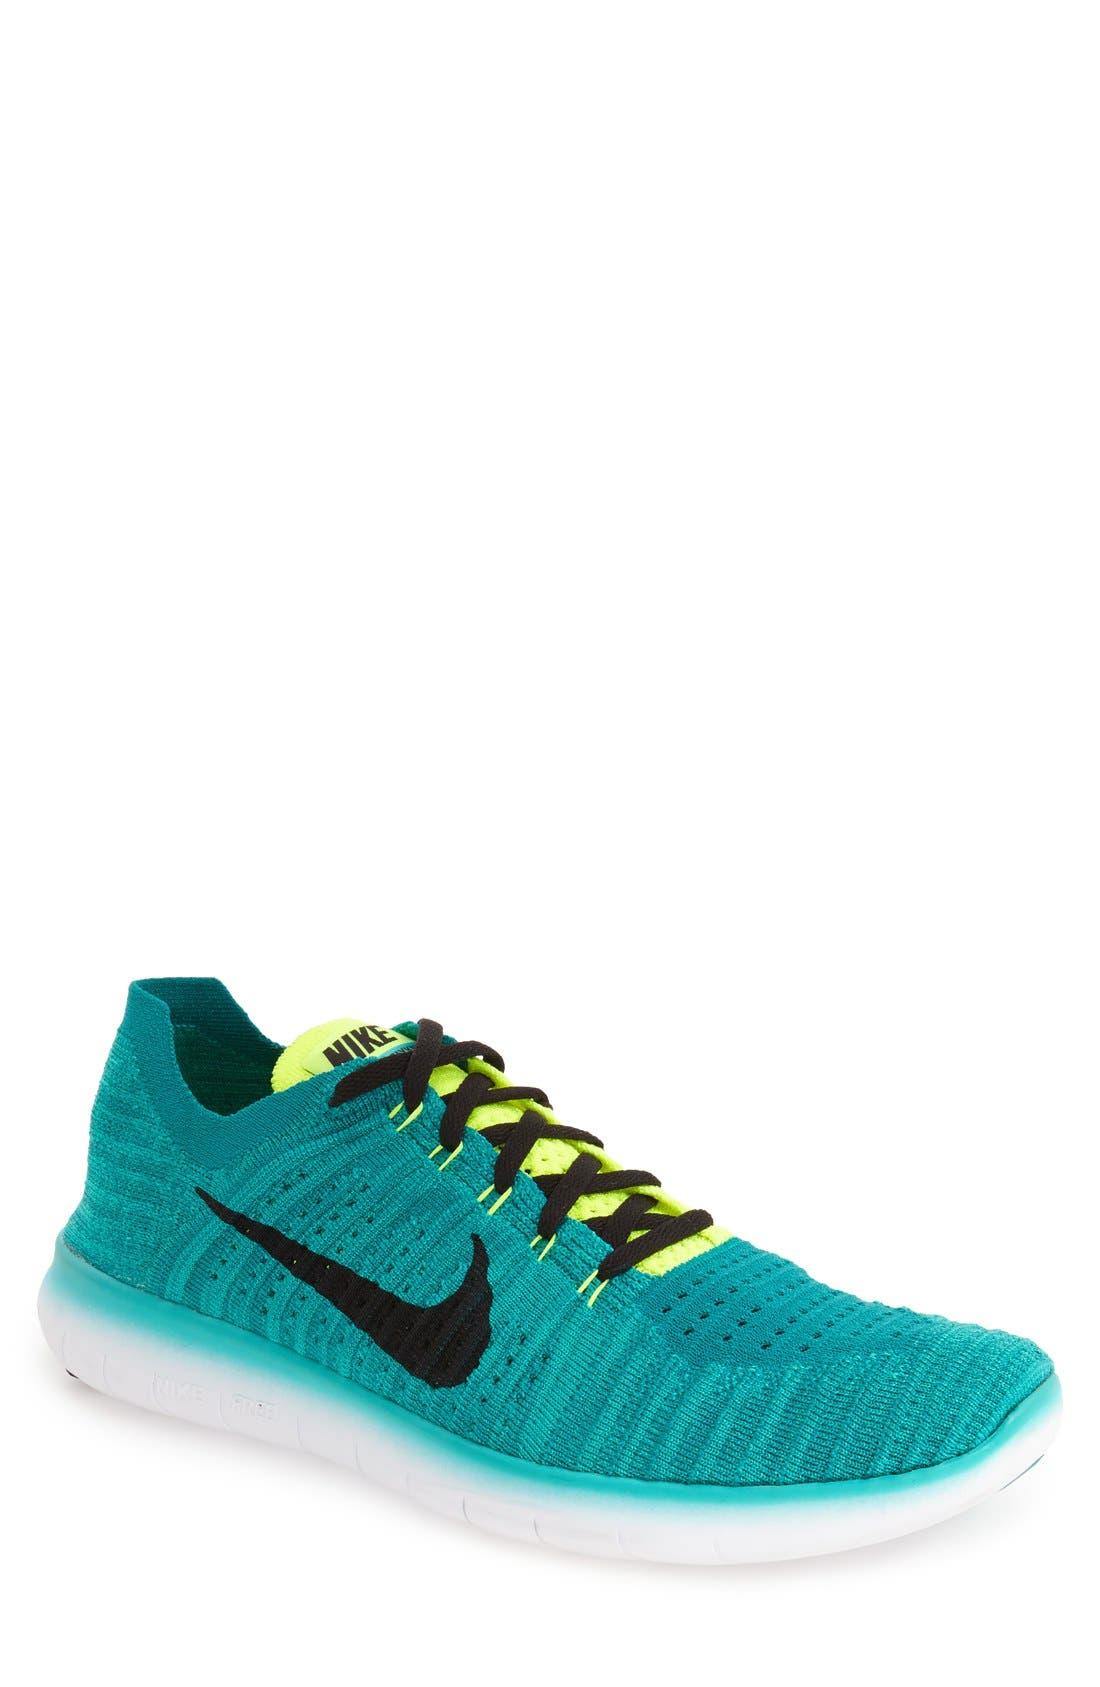 Main Image - Nike 'Free Run Flyknit' Running Shoe ...